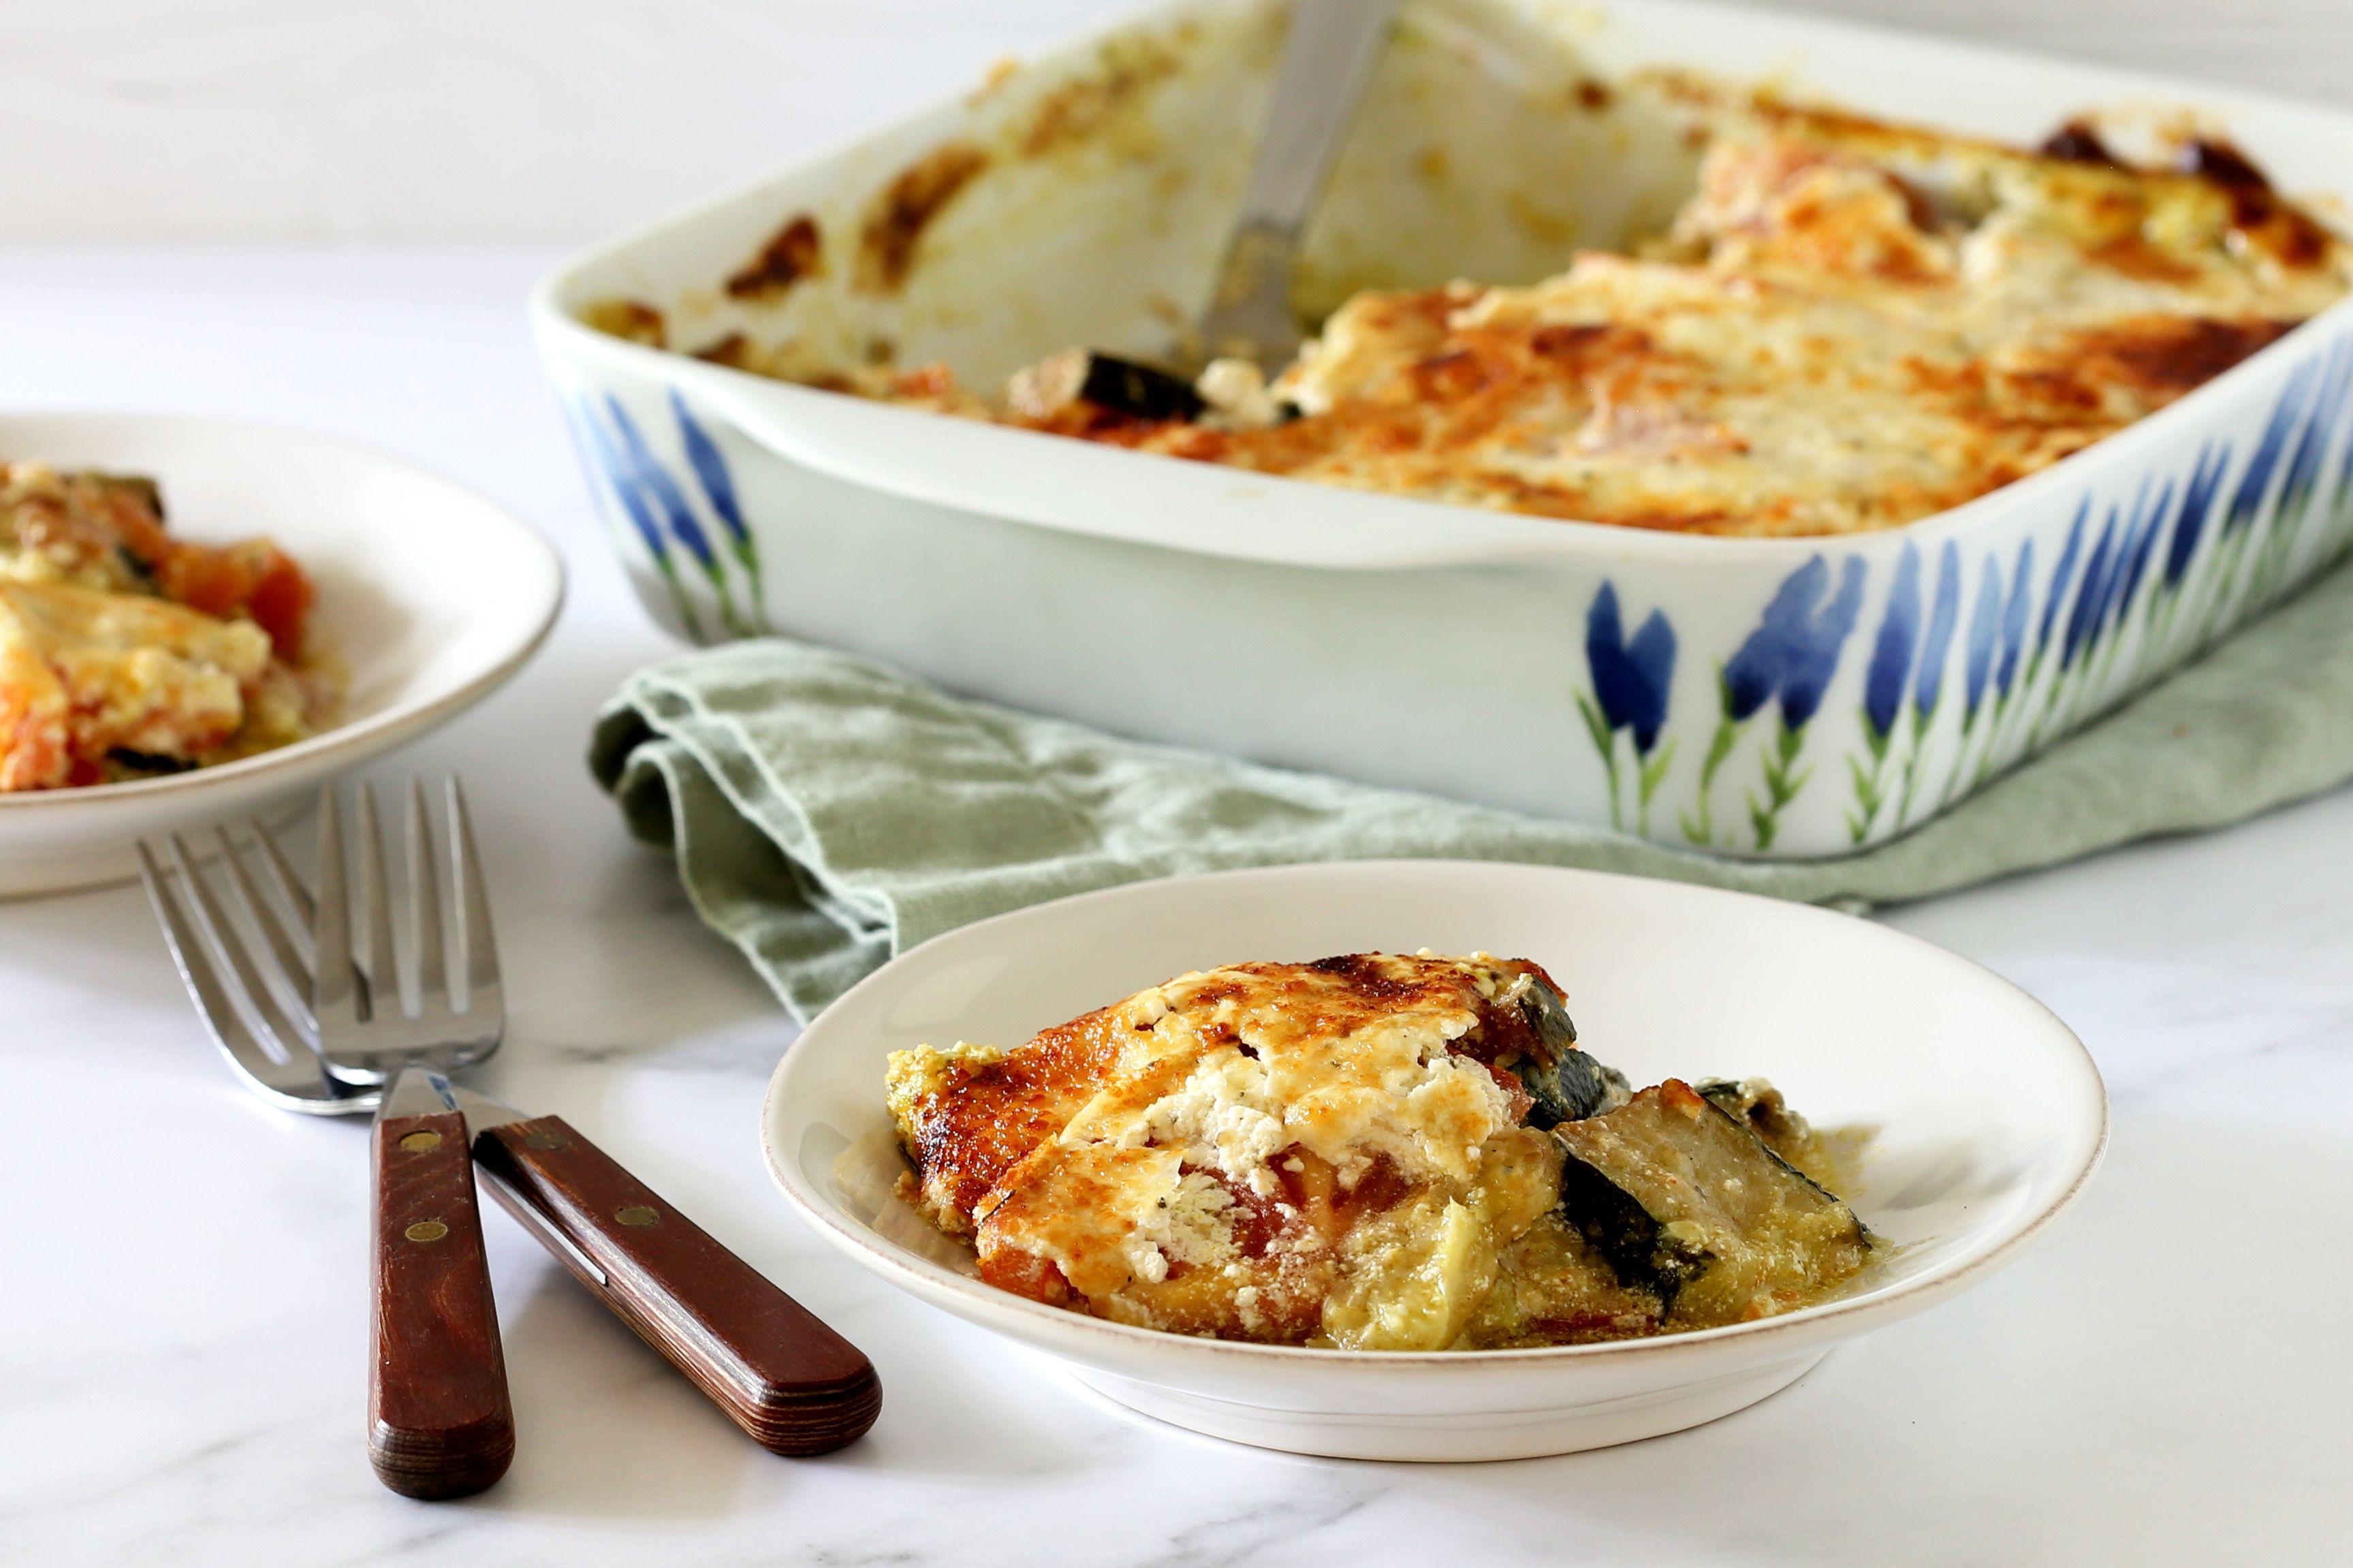 Vegetarian Baked Zucchini Parmesan